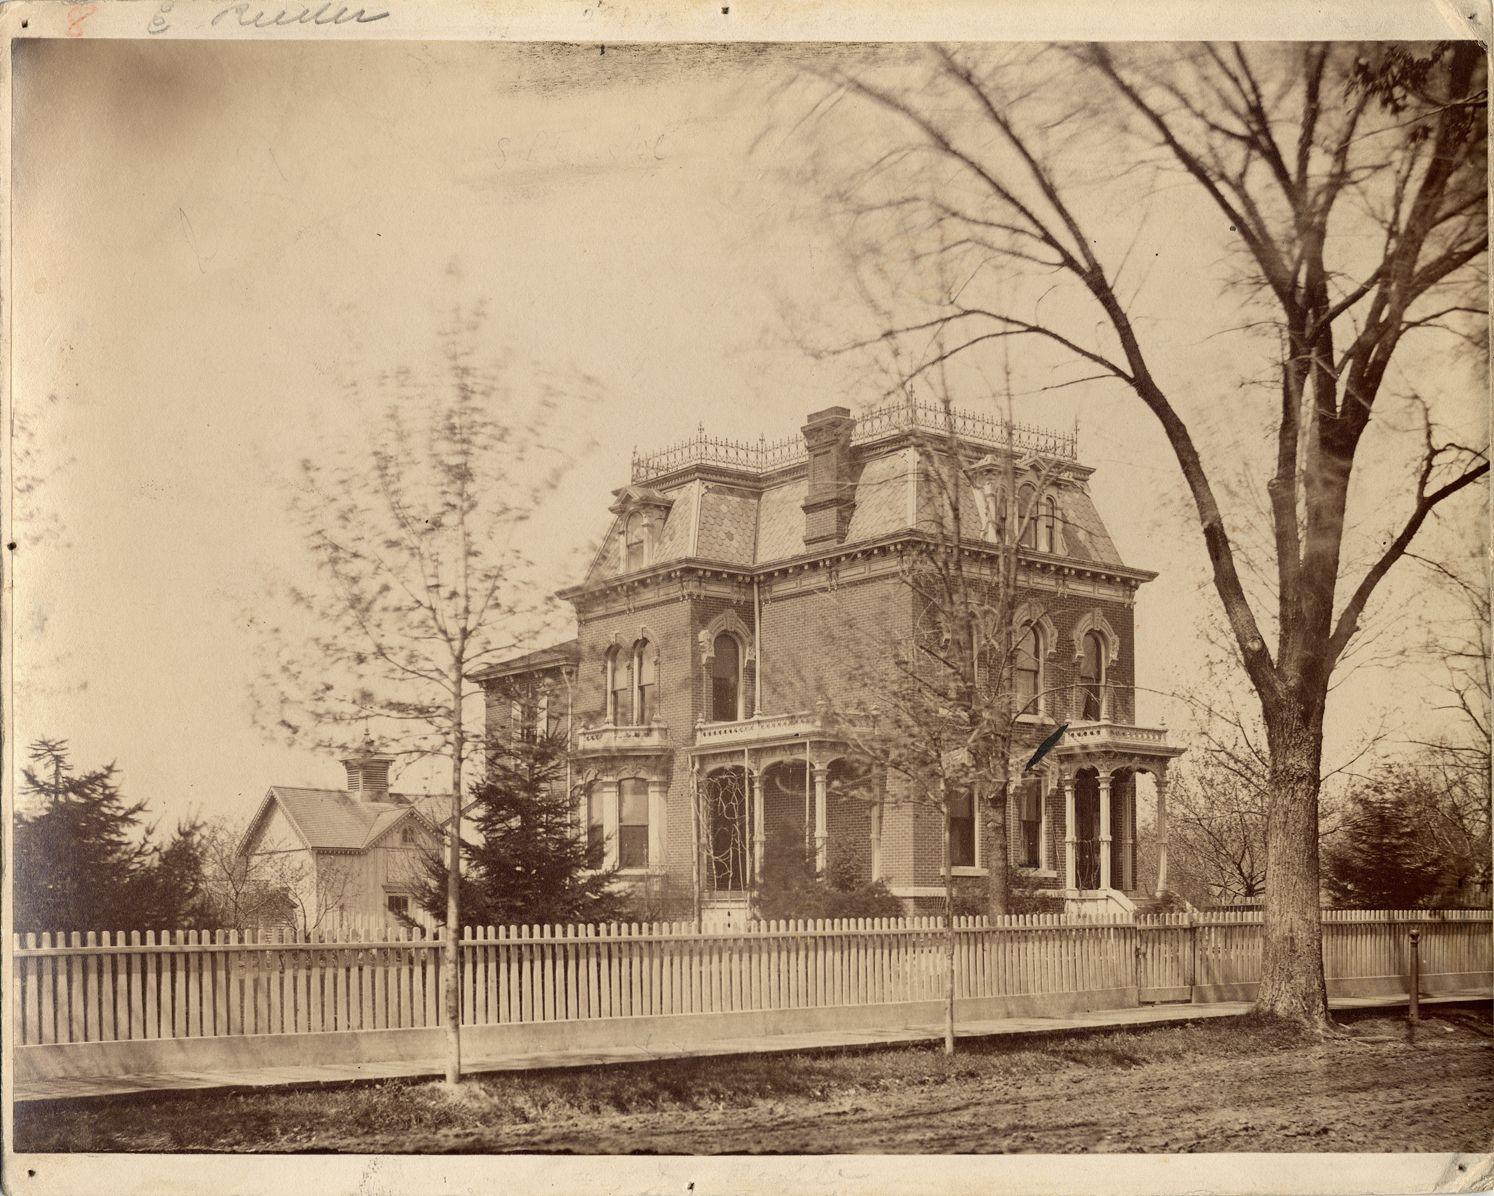 Edwin Reeder Residence Dpl Dams Detroit 5 Indian Ave N Of Fort W 1881 Cc Detroit Houses Detroit City Detroit History